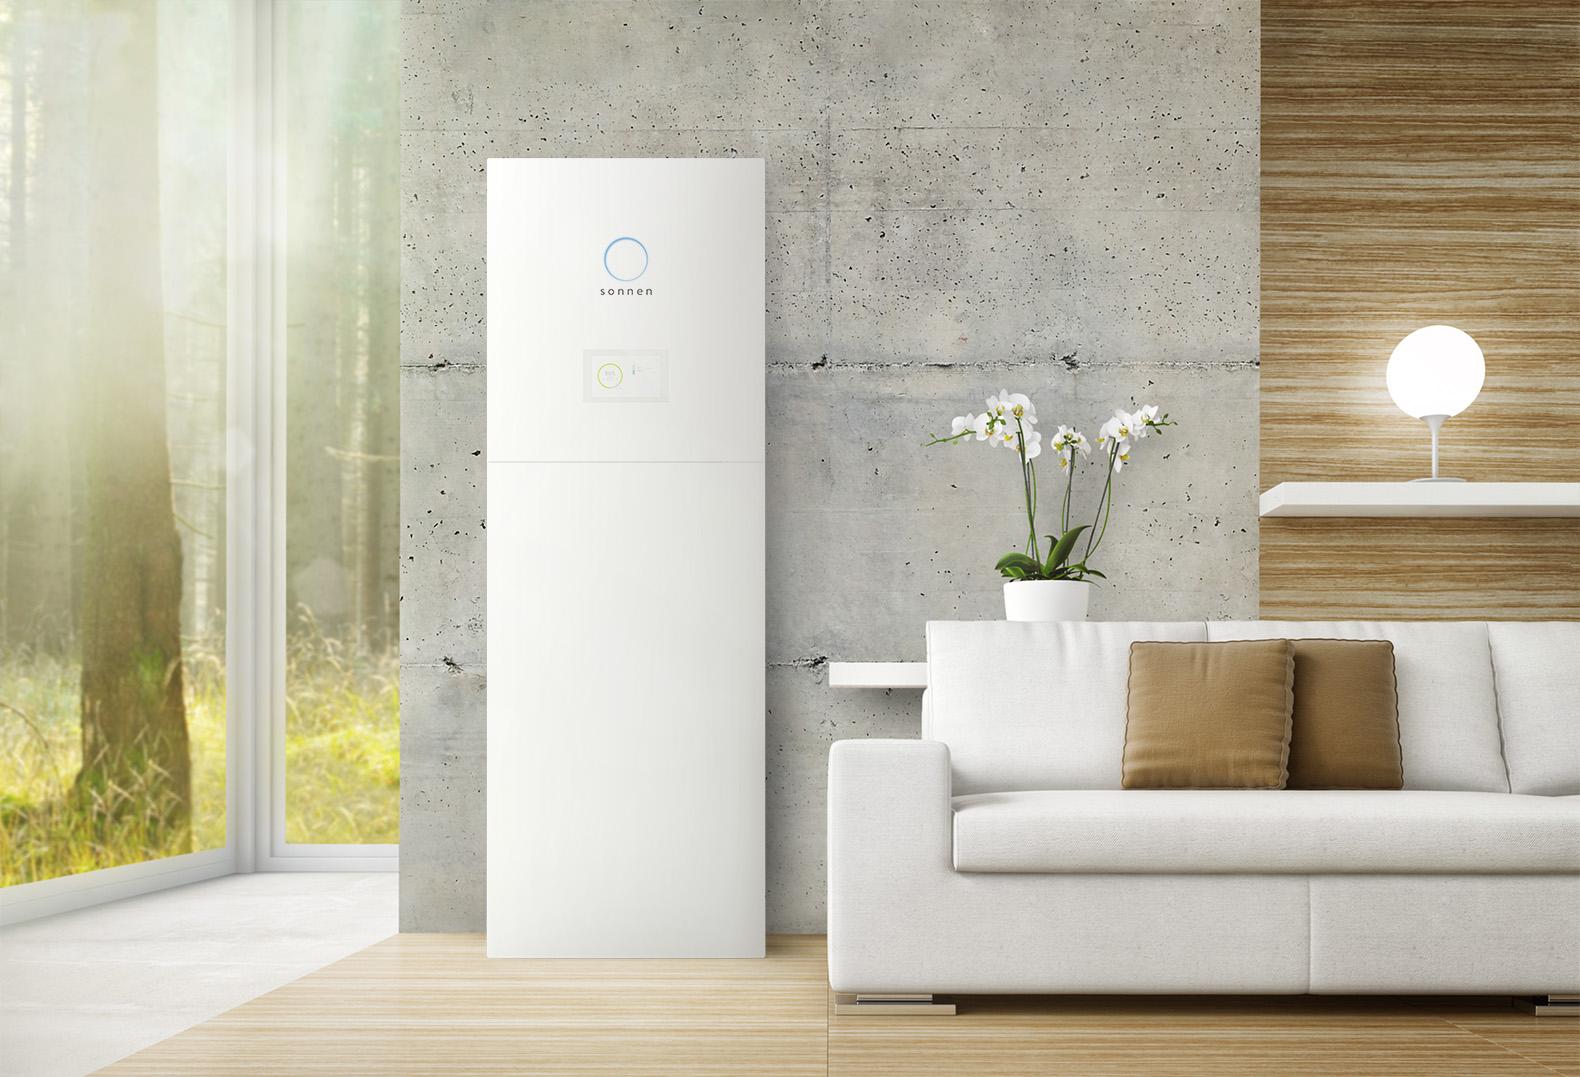 Sonnen Plans Australian Battery Plant And Vpp To Meet Btm Demand Energy Storage Journal